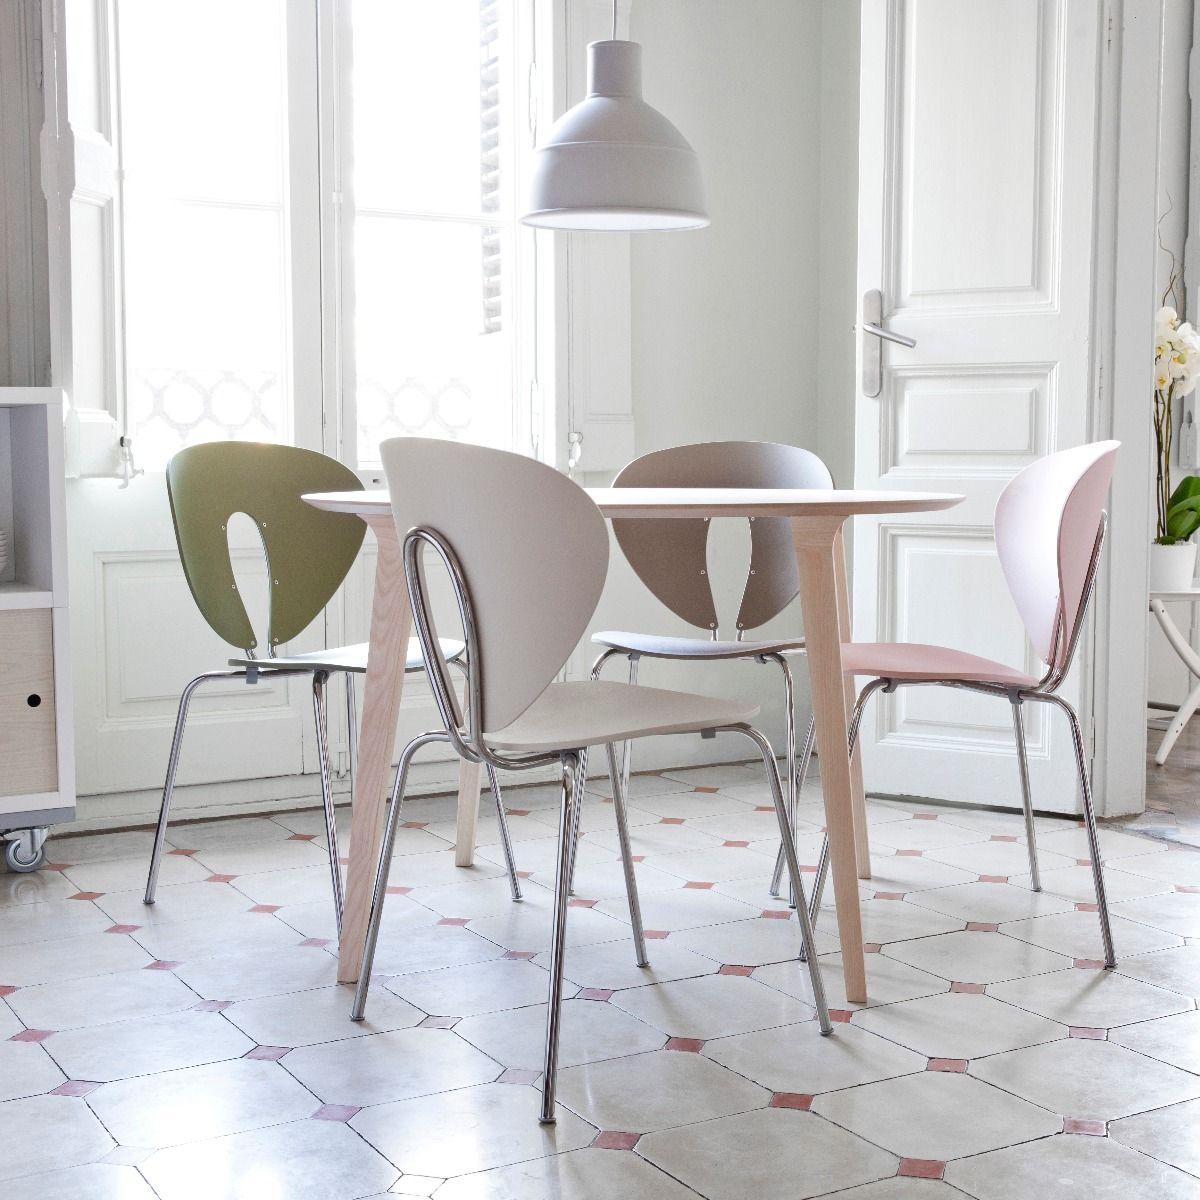 STUA Globus Polypropylene Chair around an ash table in a Spanish apartment